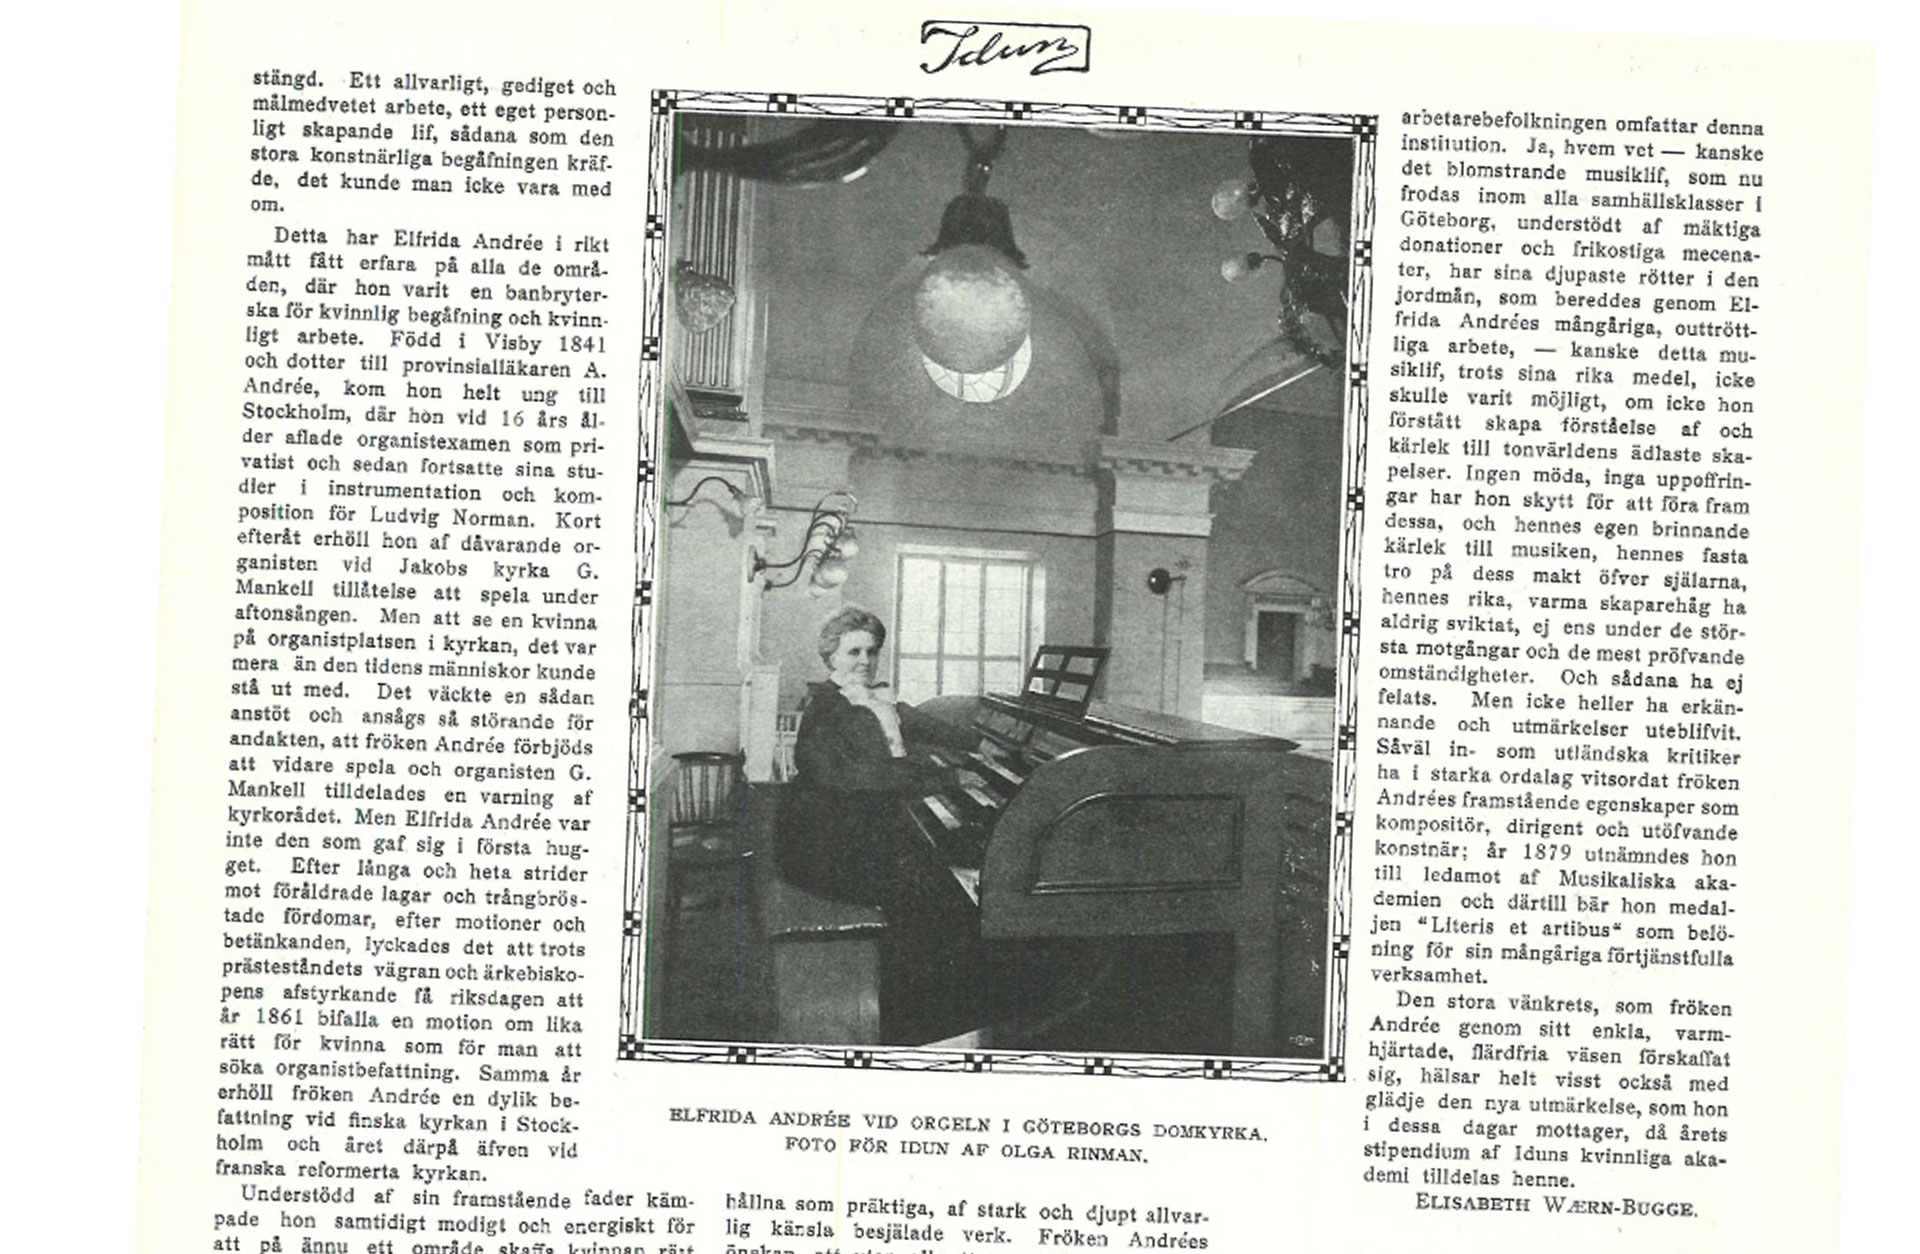 Faksimil ur tidningen IDUN 6 feb 1908. Alfrida Endrée sitter vid domkyrkoorgeln.